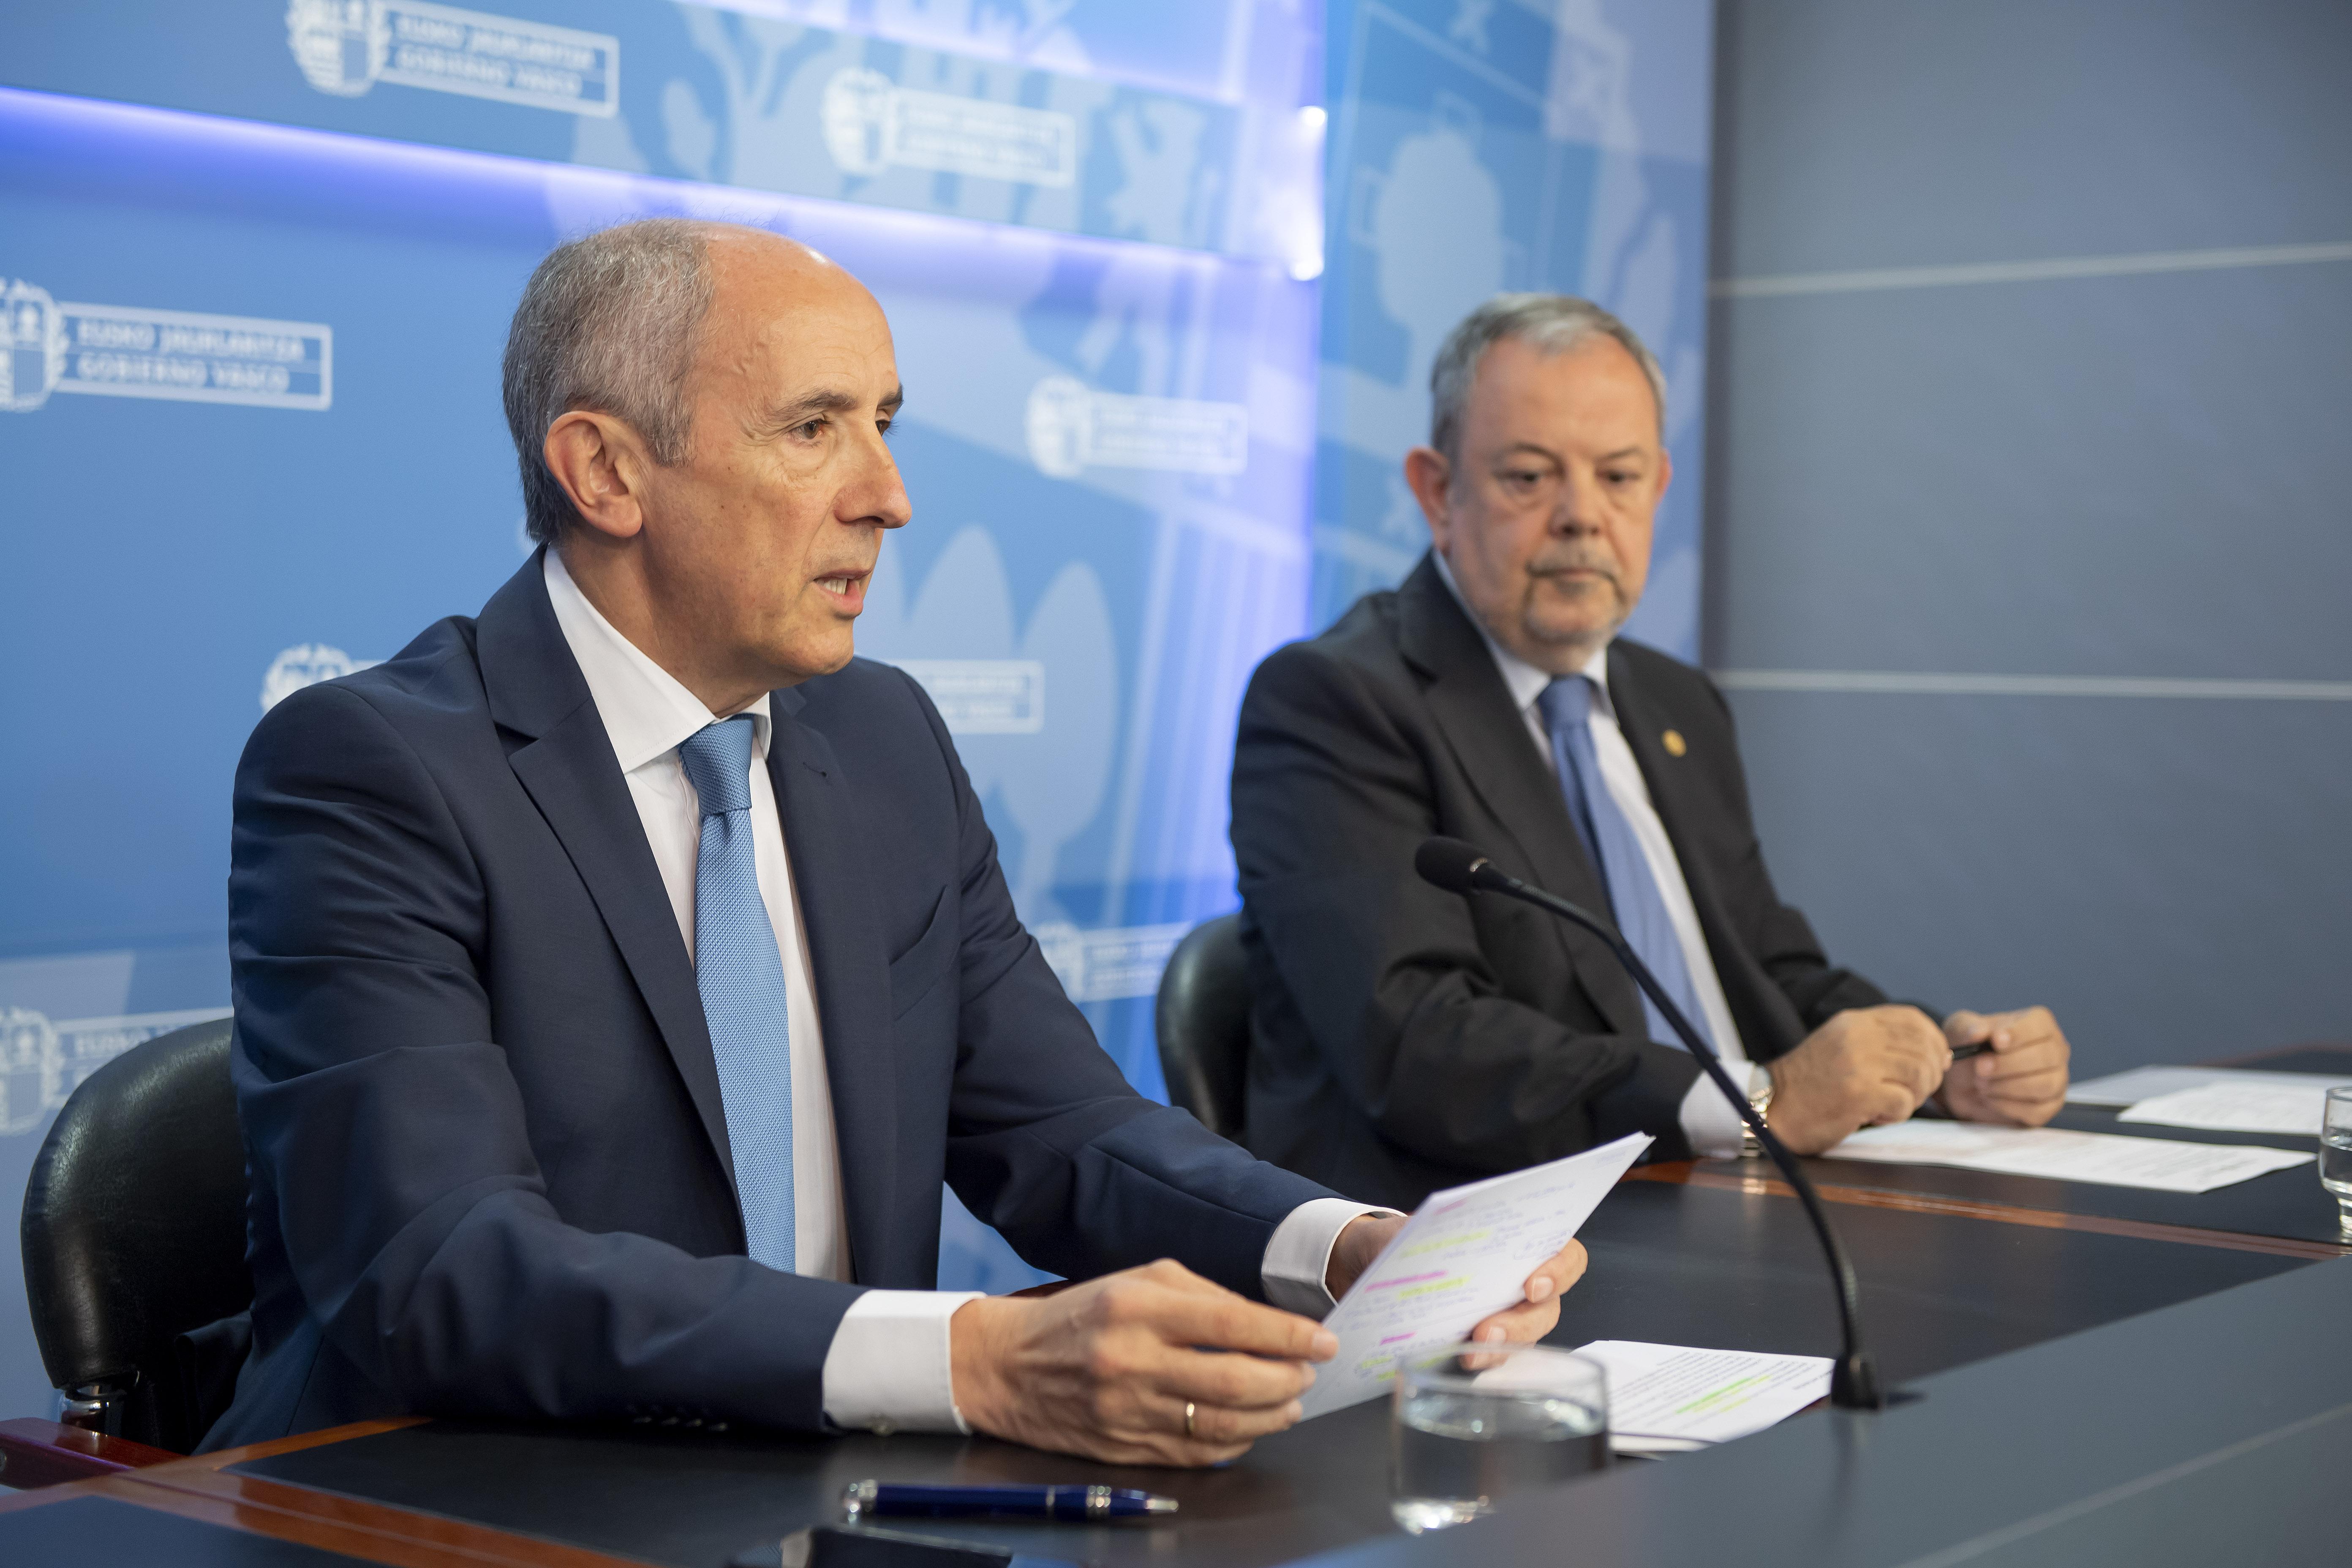 2018_06_12_consejo_gobierno_02.jpg